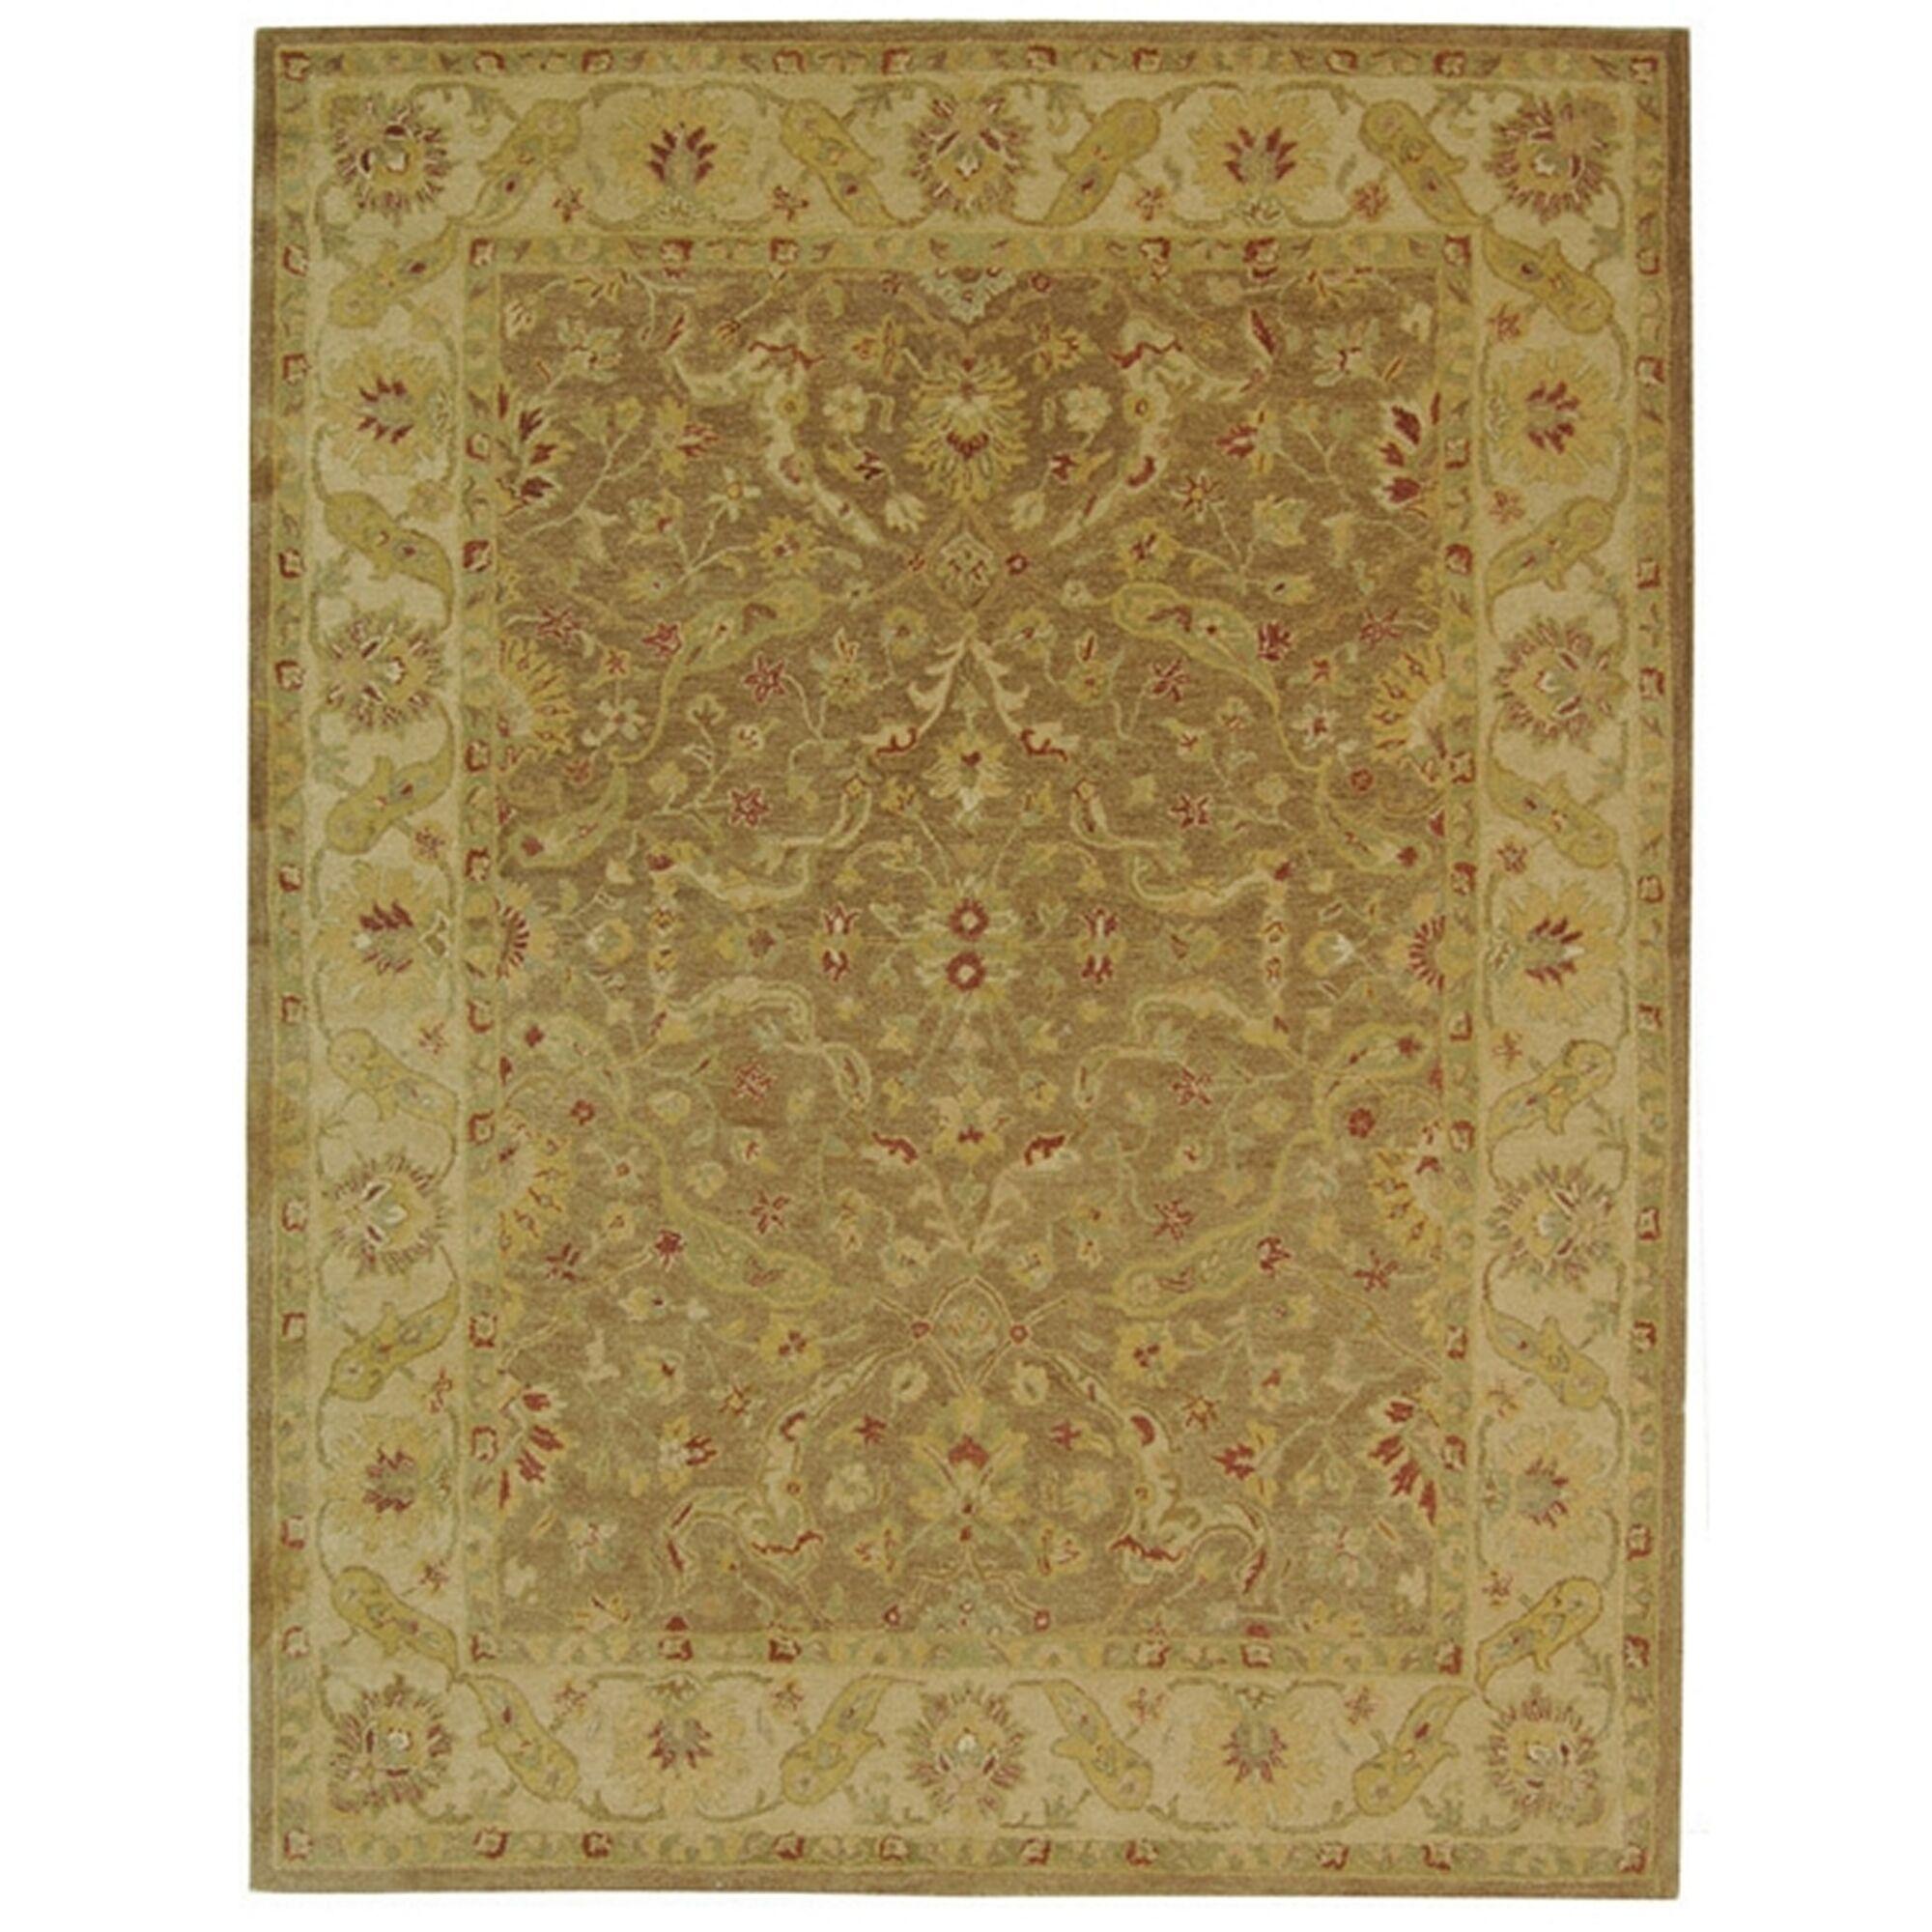 Dunbar Hand-Woven Wool Brown/Gold Area Rug Rug Size: Rectangle 11' x 17'